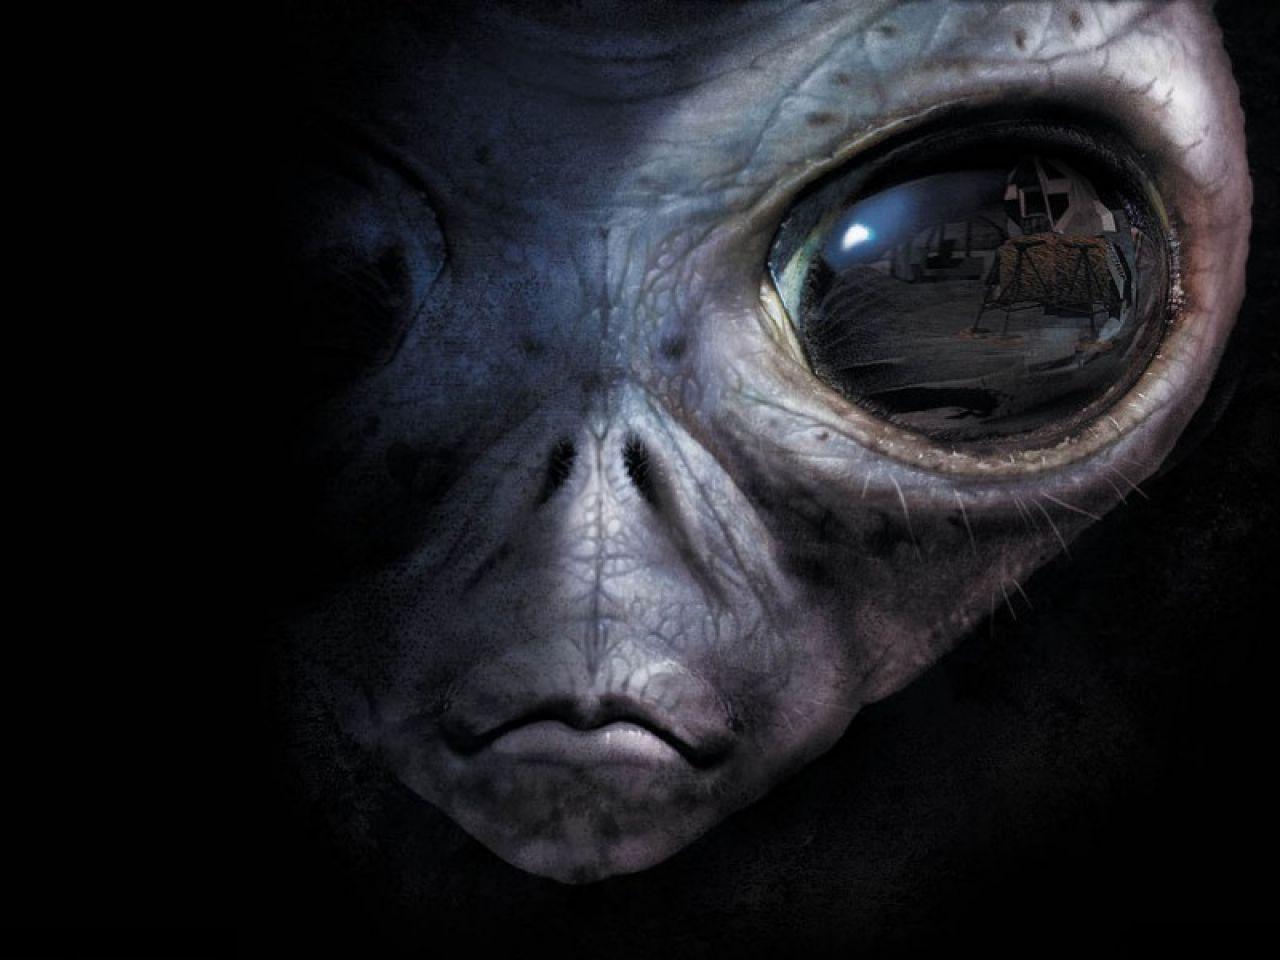 extraterrestre mechant